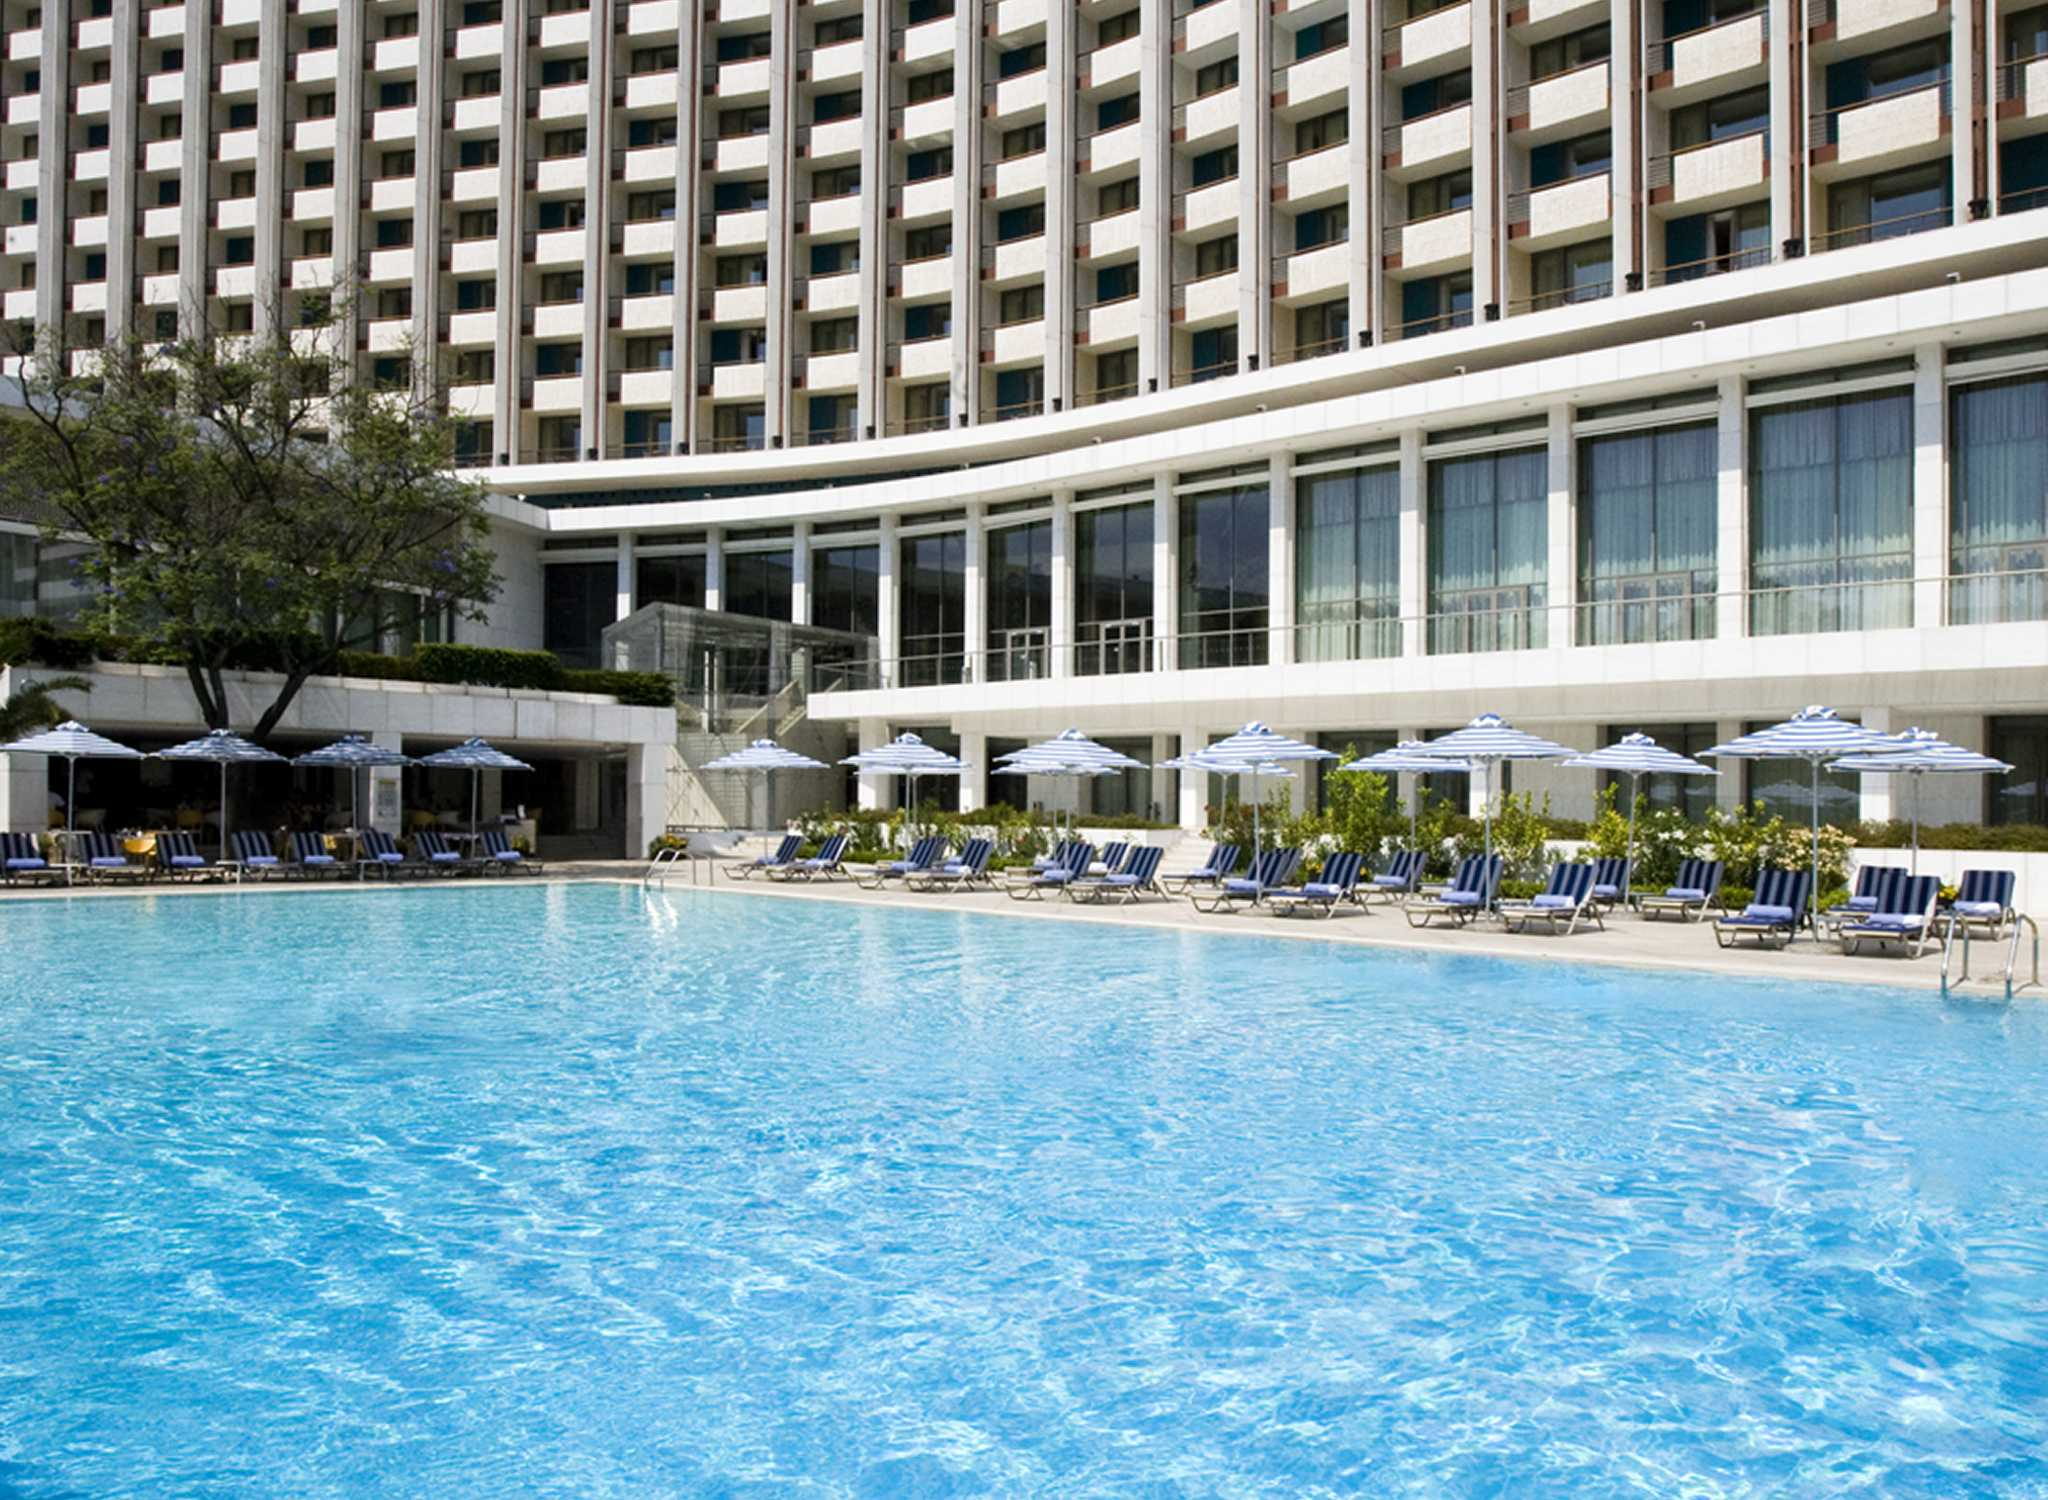 Canopy Hotel Hilton